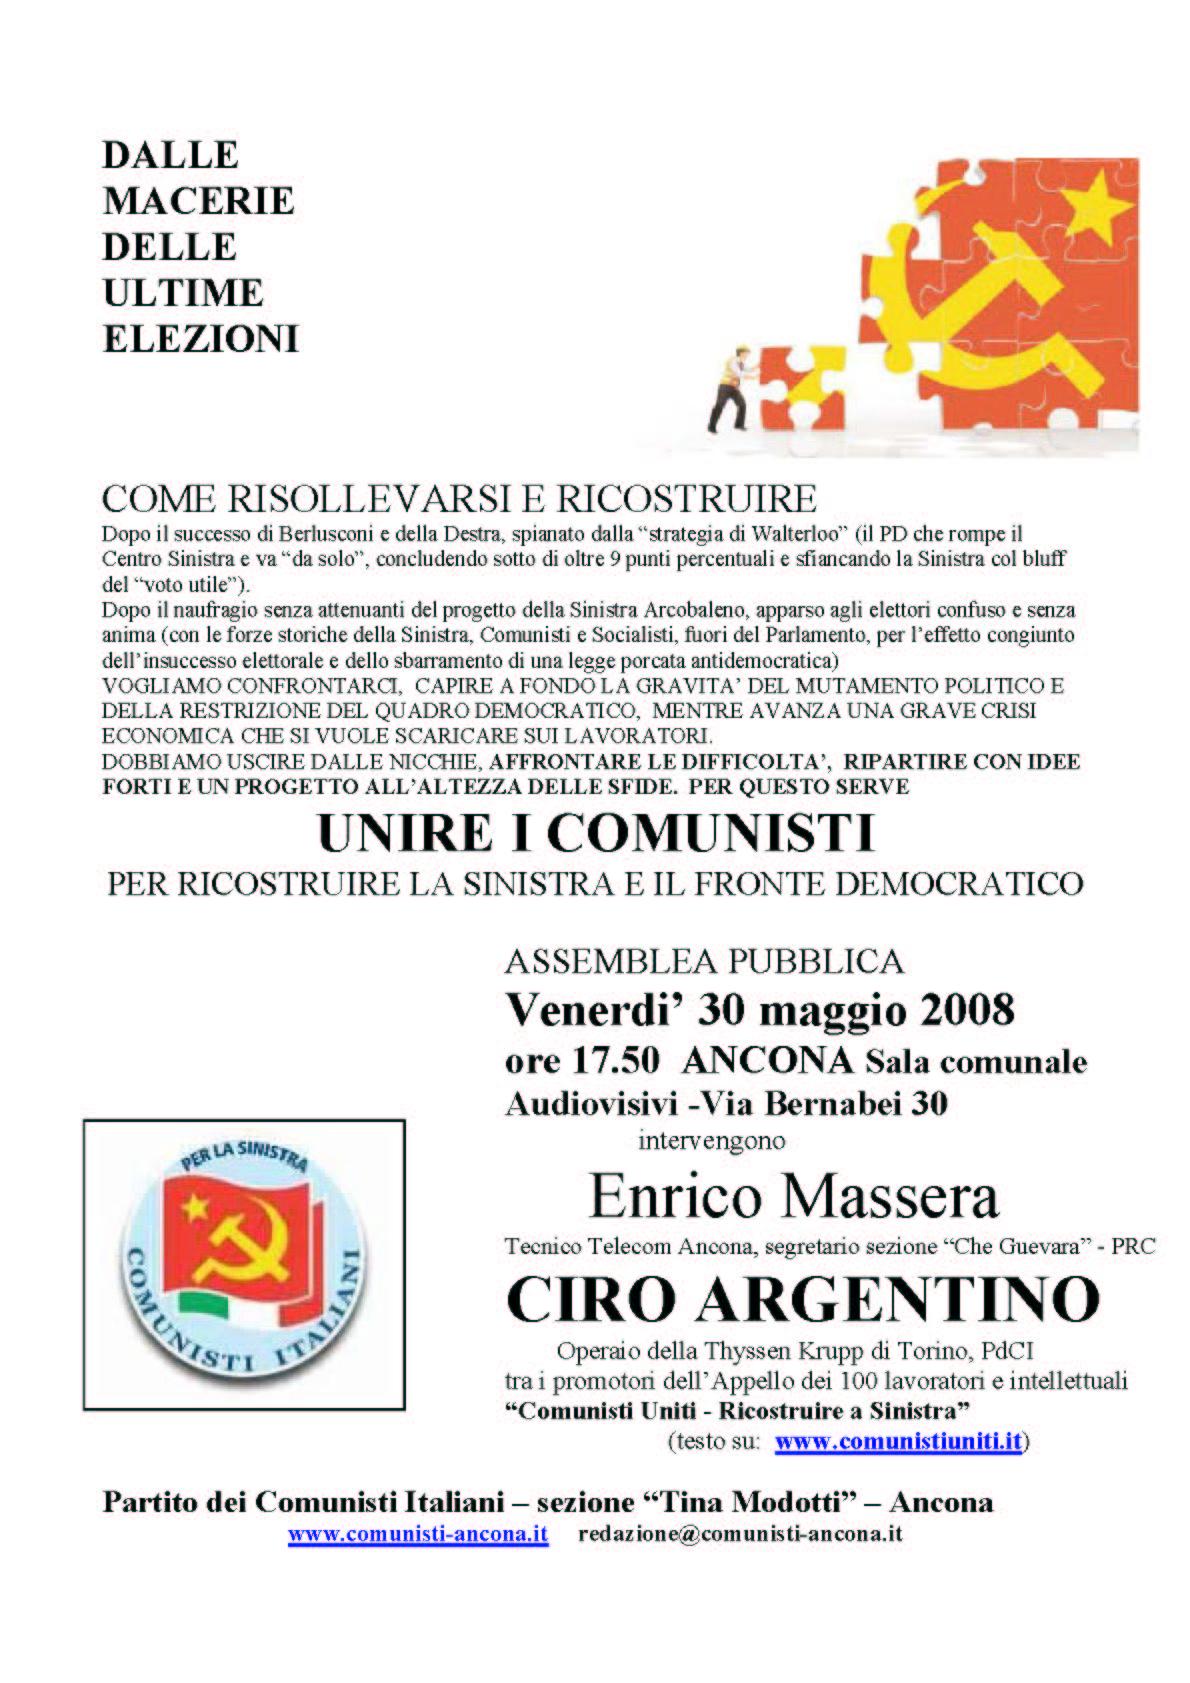 <!--enpts-->volantino-ciro-_1_.jpg<!--enpte-->